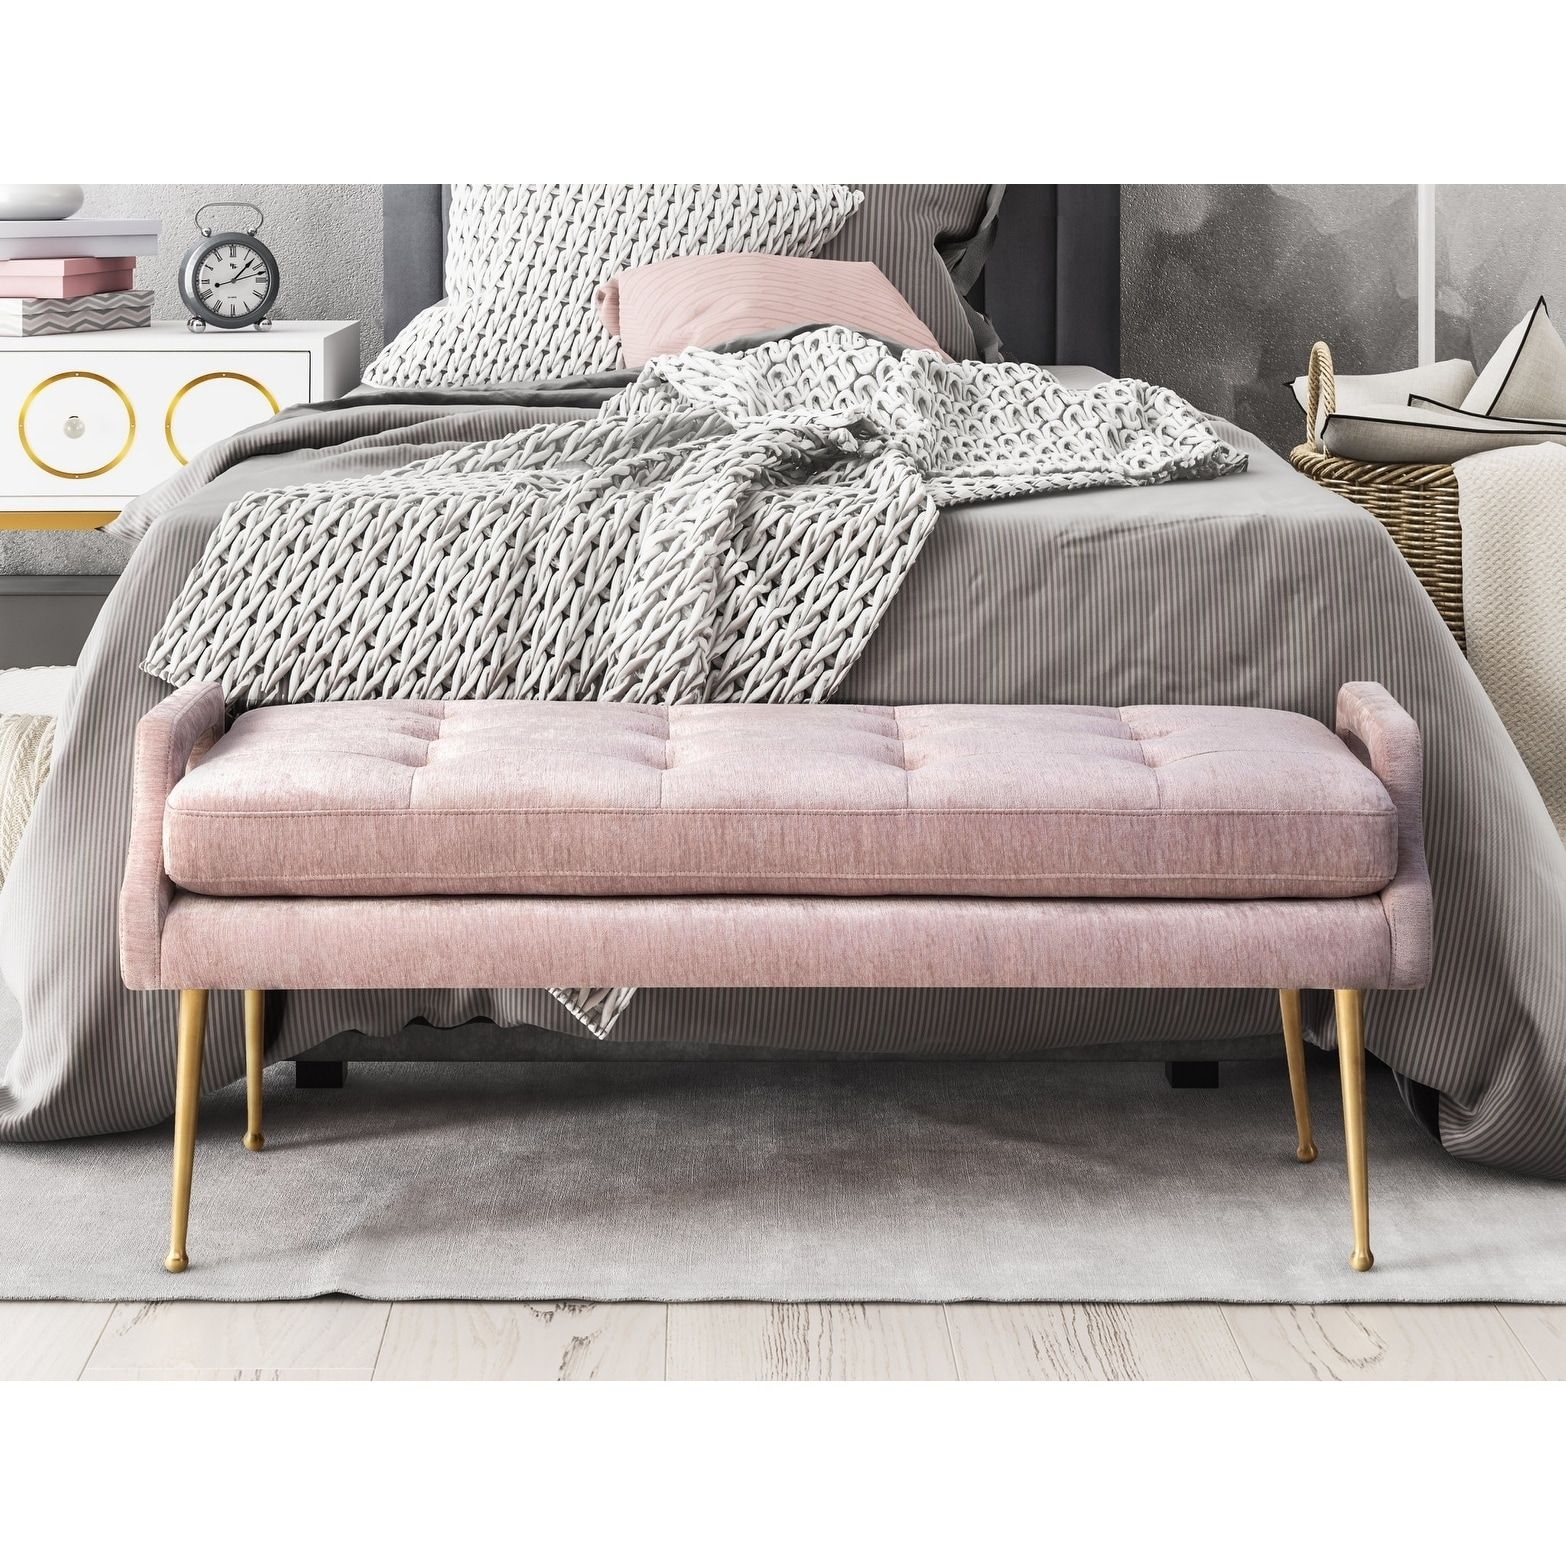 Best Online Furniture Stores Affordable: Eileen Blush Slub Velvet Bench, Pink